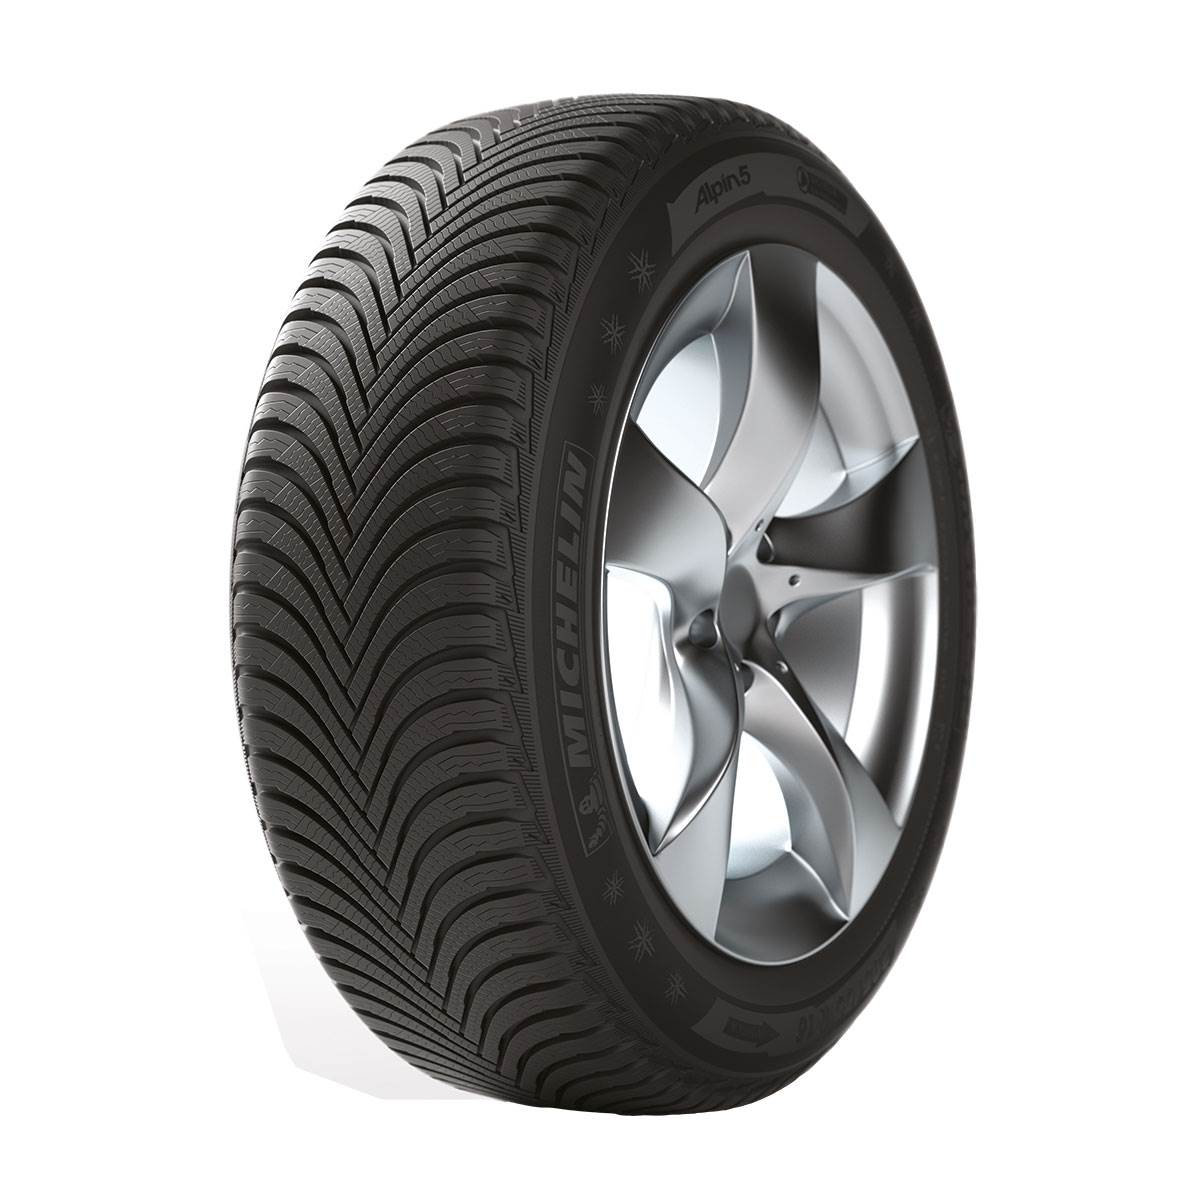 Pneu Hiver Michelin 205/60R16 92T Alpin A5